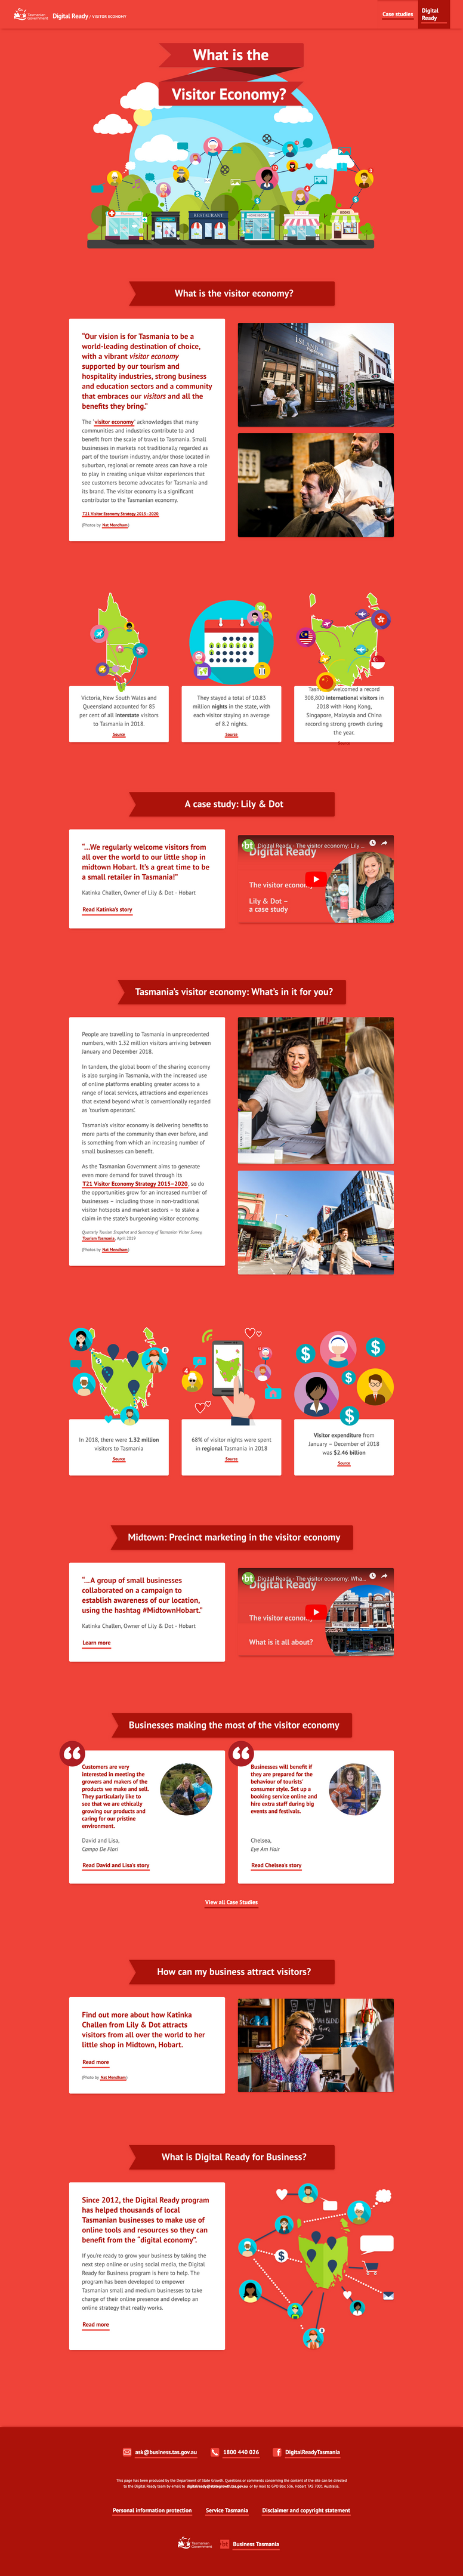 UX/UI design for Digital Ready Visitor Economy